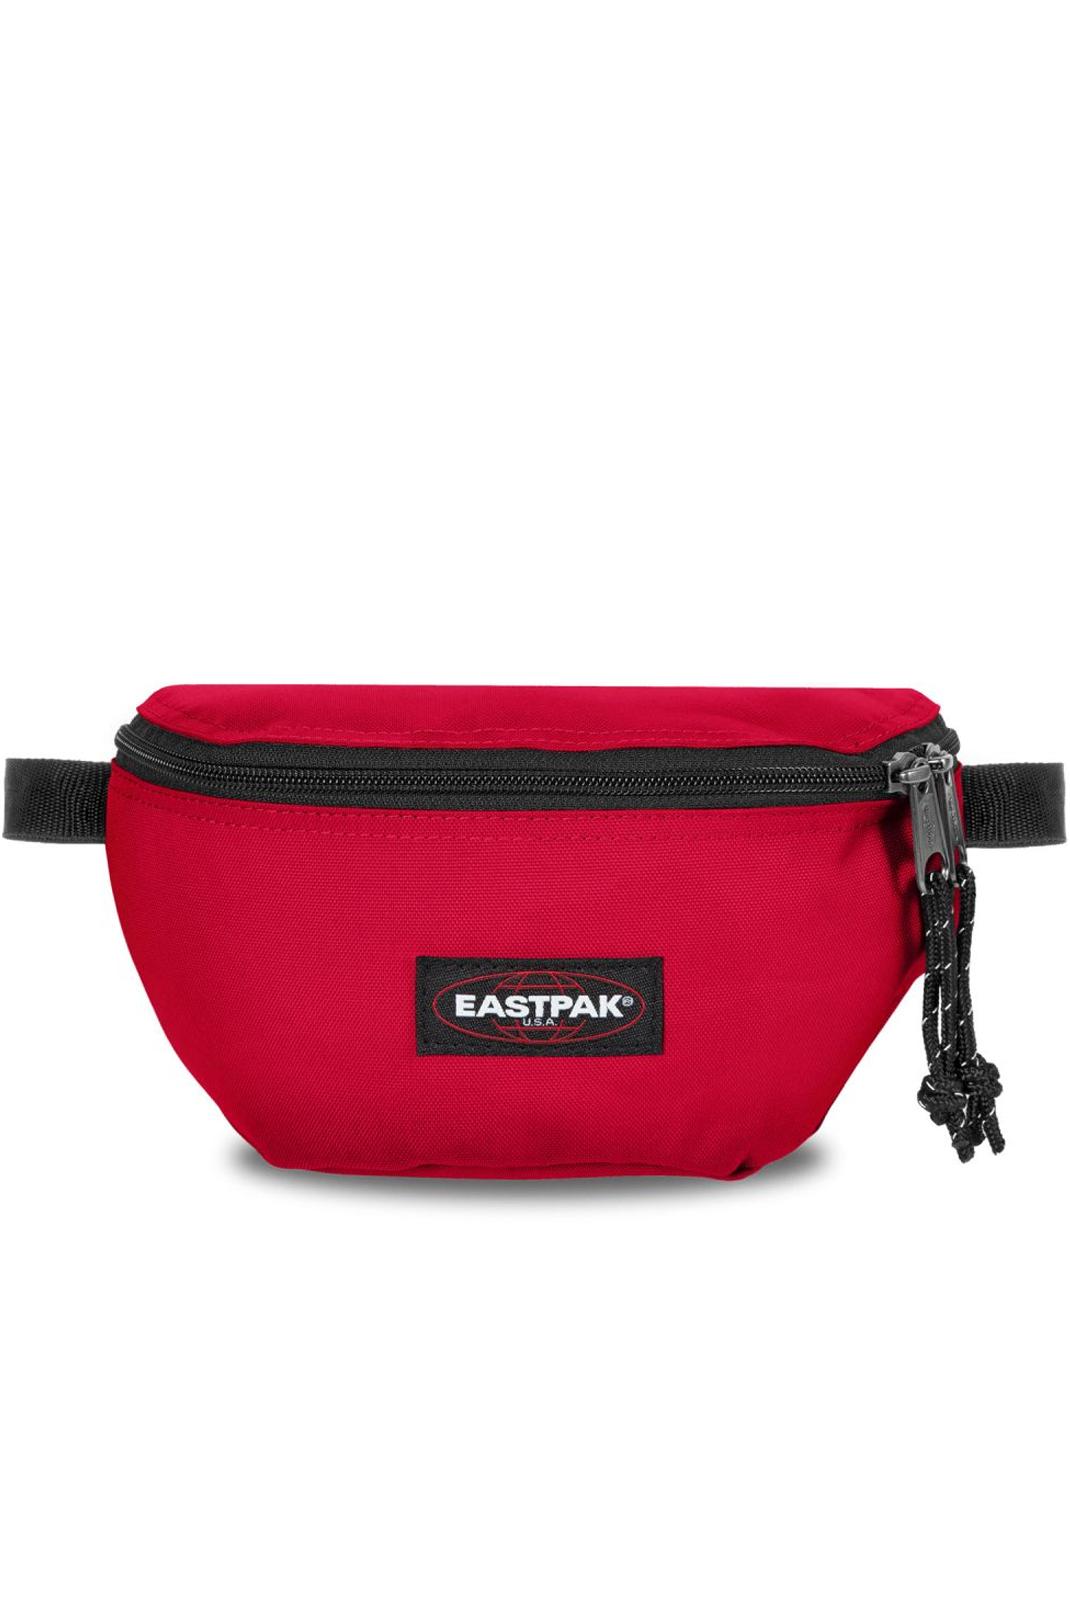 Sac porté épaule  Eastpak EK07484Z   84Z rouge